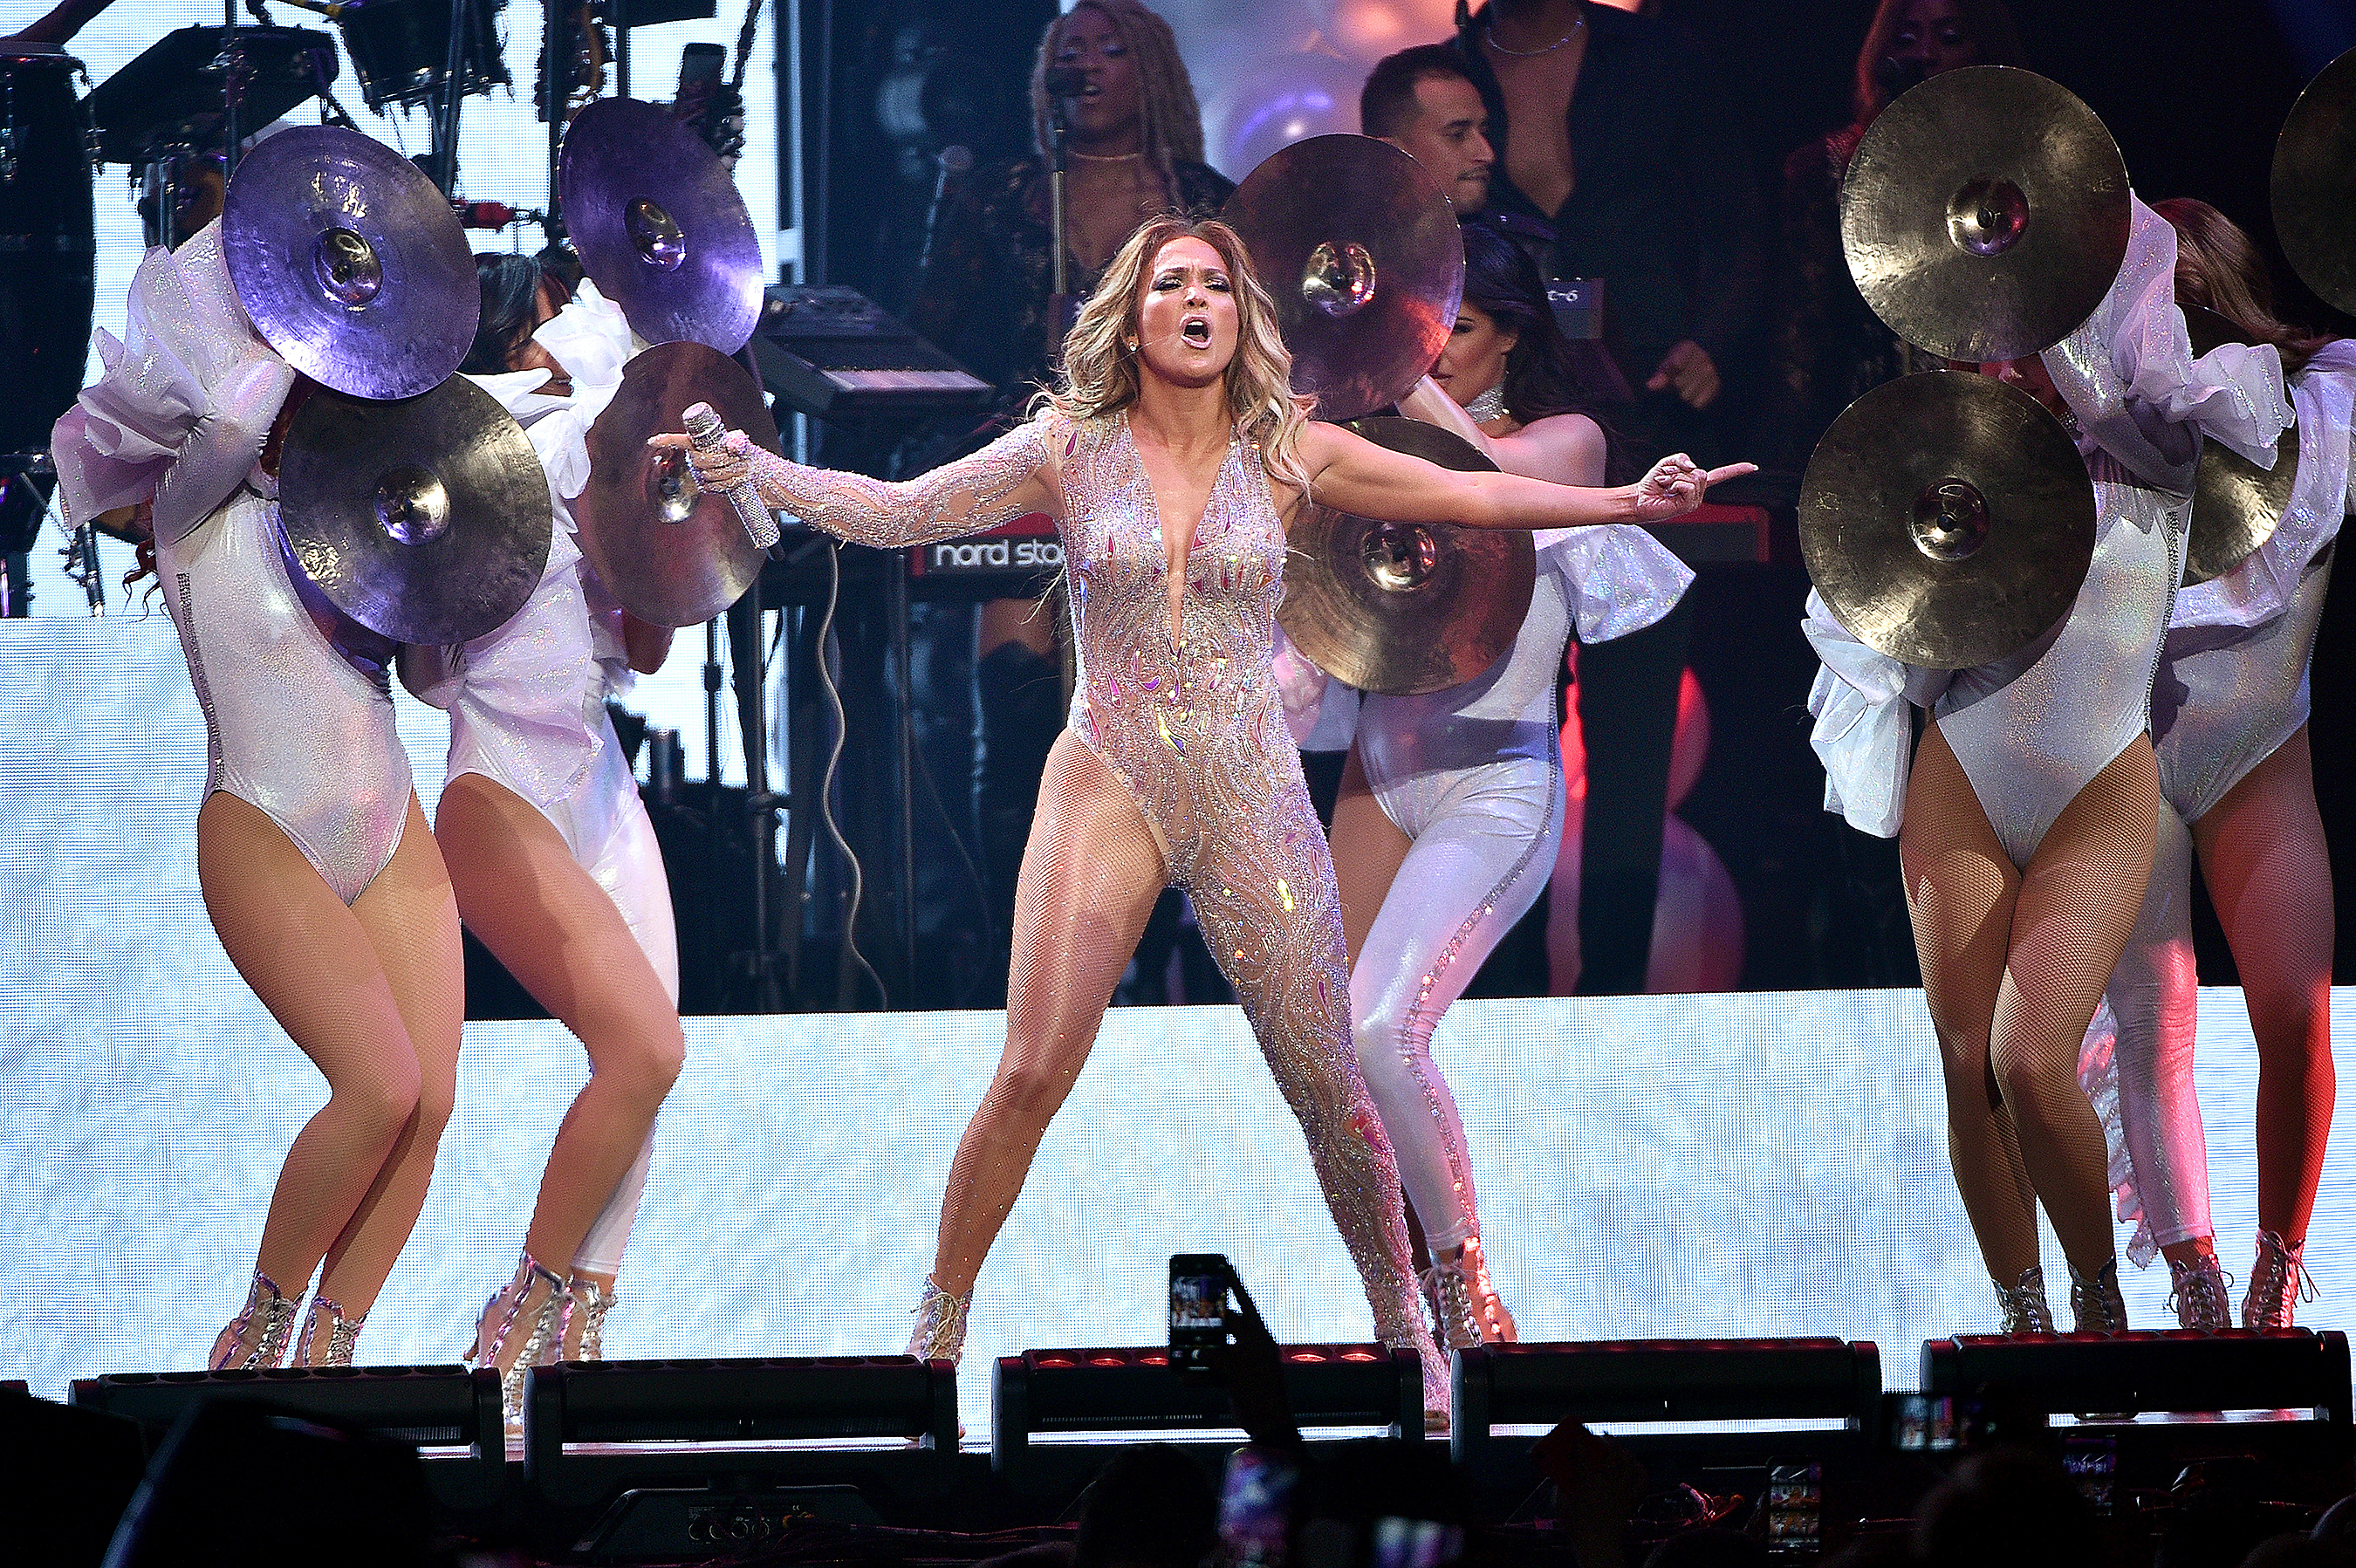 Jennifer Lopez 'devastated' after blackout shuts down New York concert